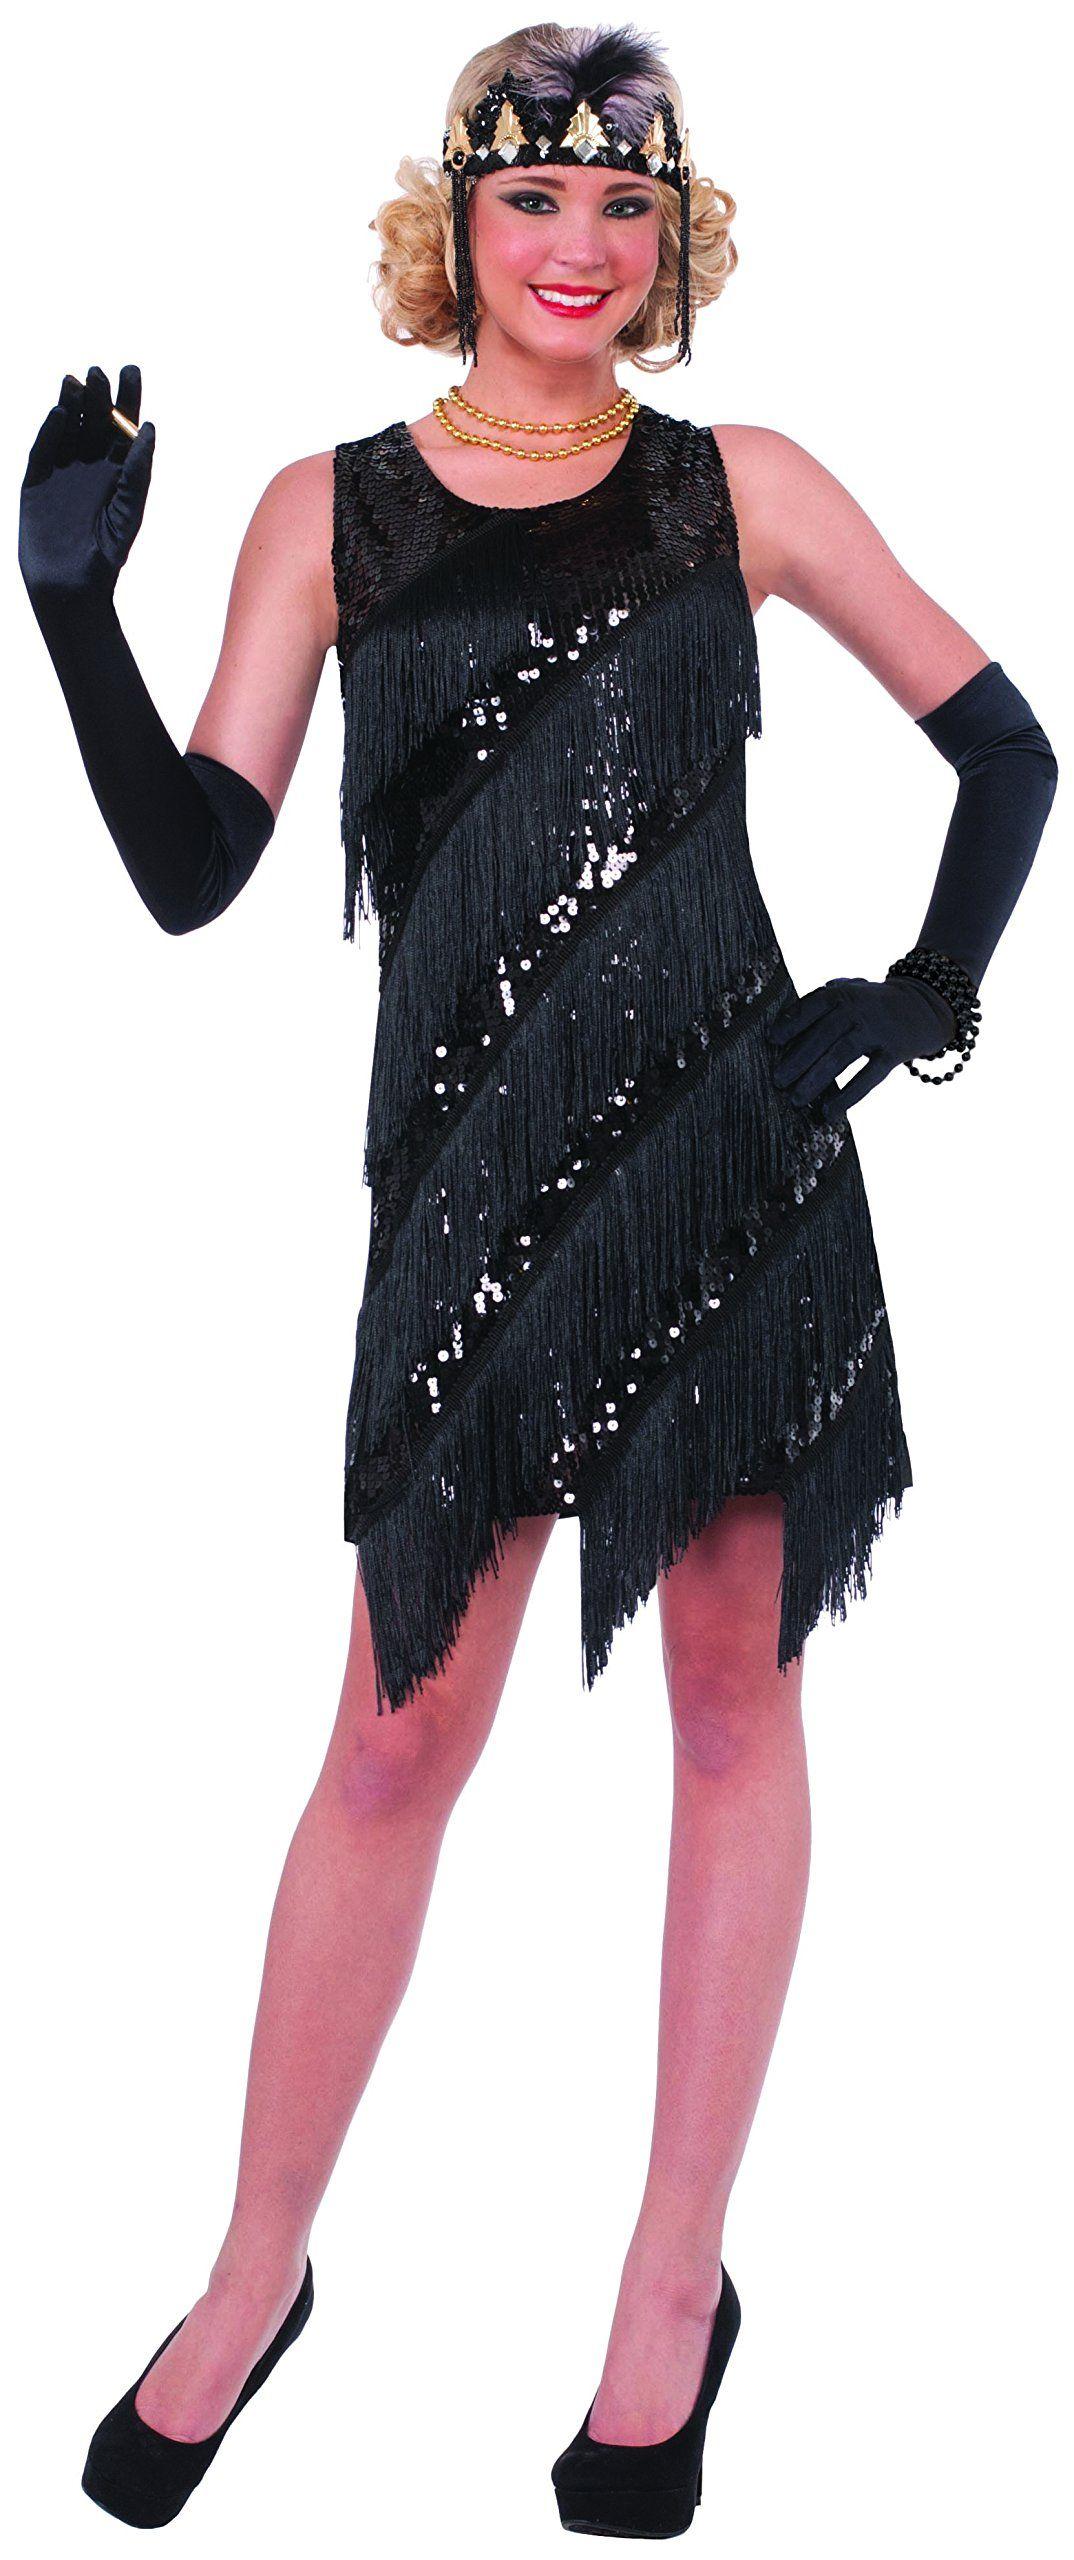 c7a8de2490 Forum Novelties Women s Midnight Dazzle Flapper Costume Dress